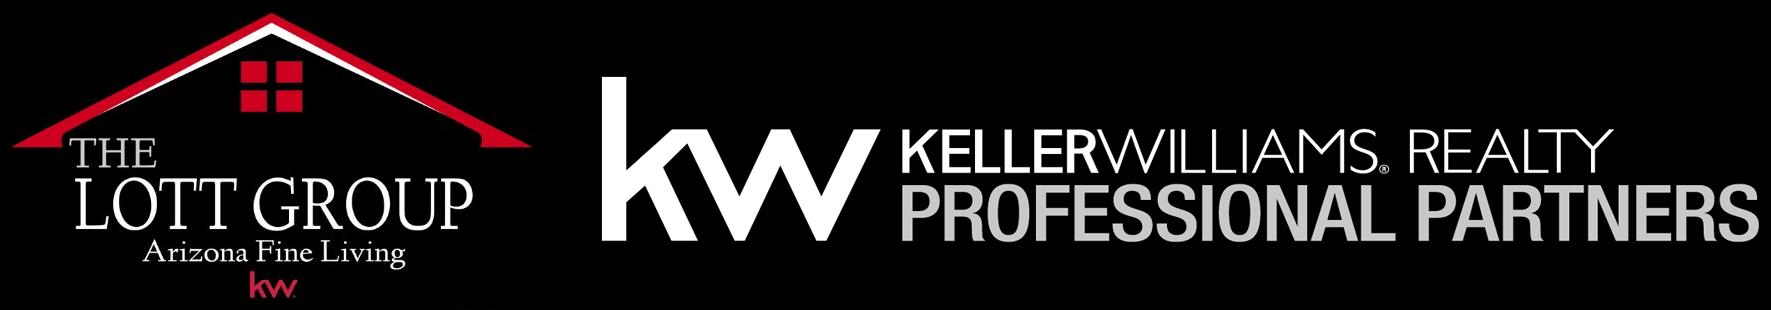 The Lott Group | Keller Williams